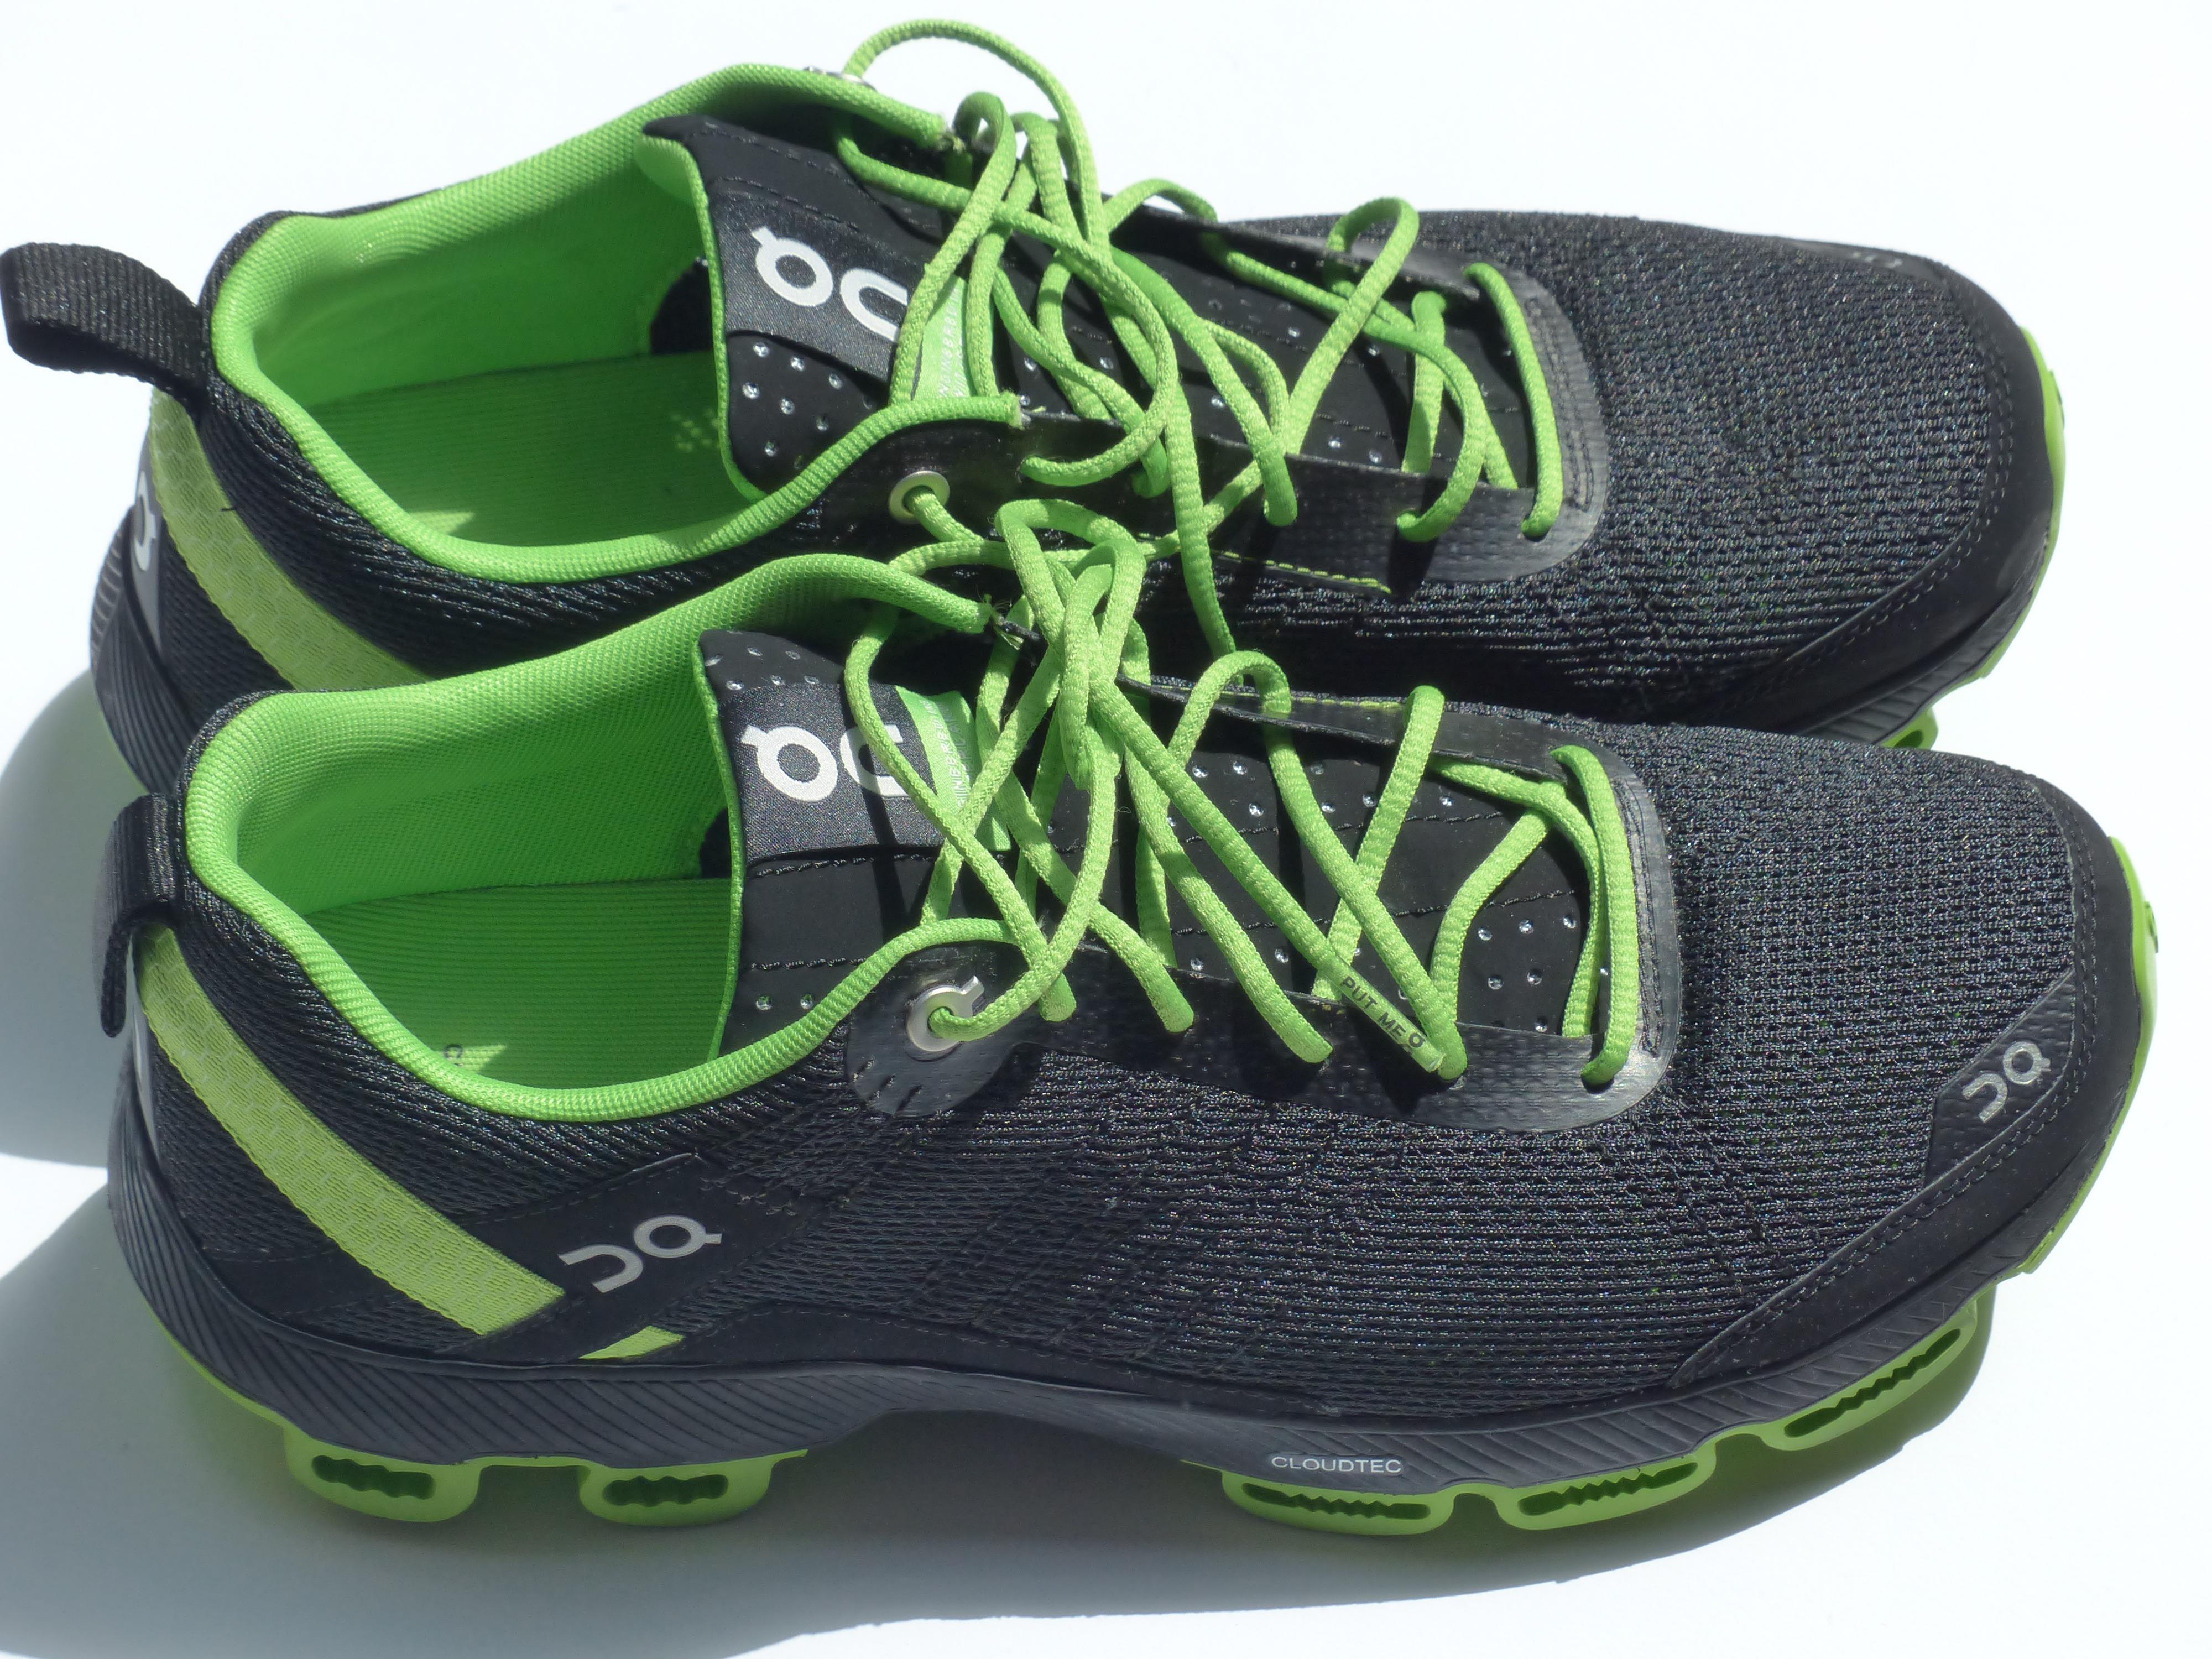 Free Images : sport, run, green, black, running shoe ...